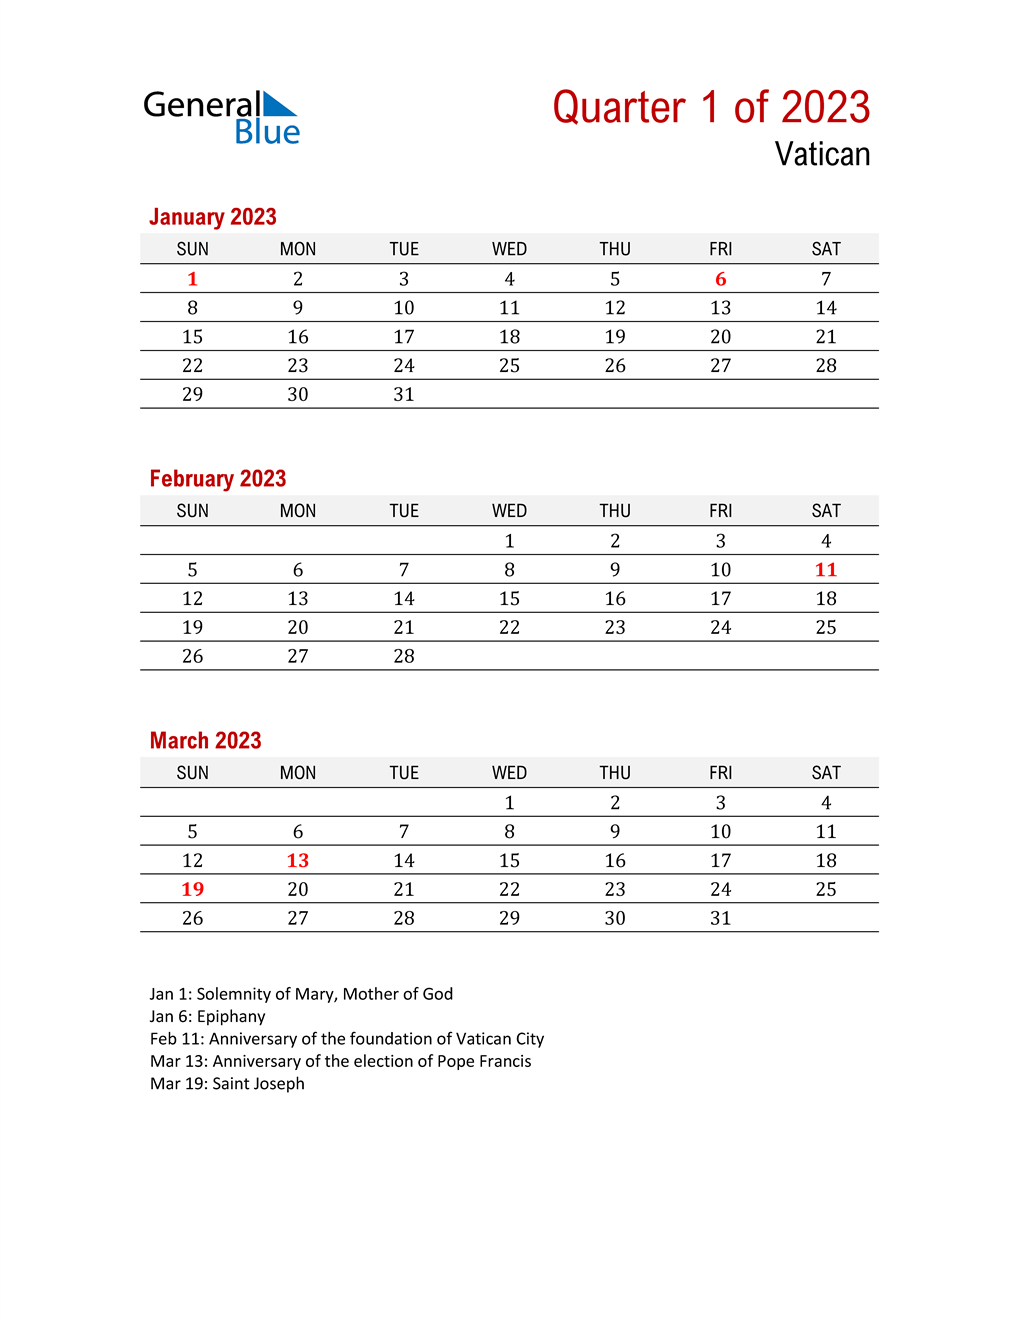 Printable Three Month Calendar for Vatican